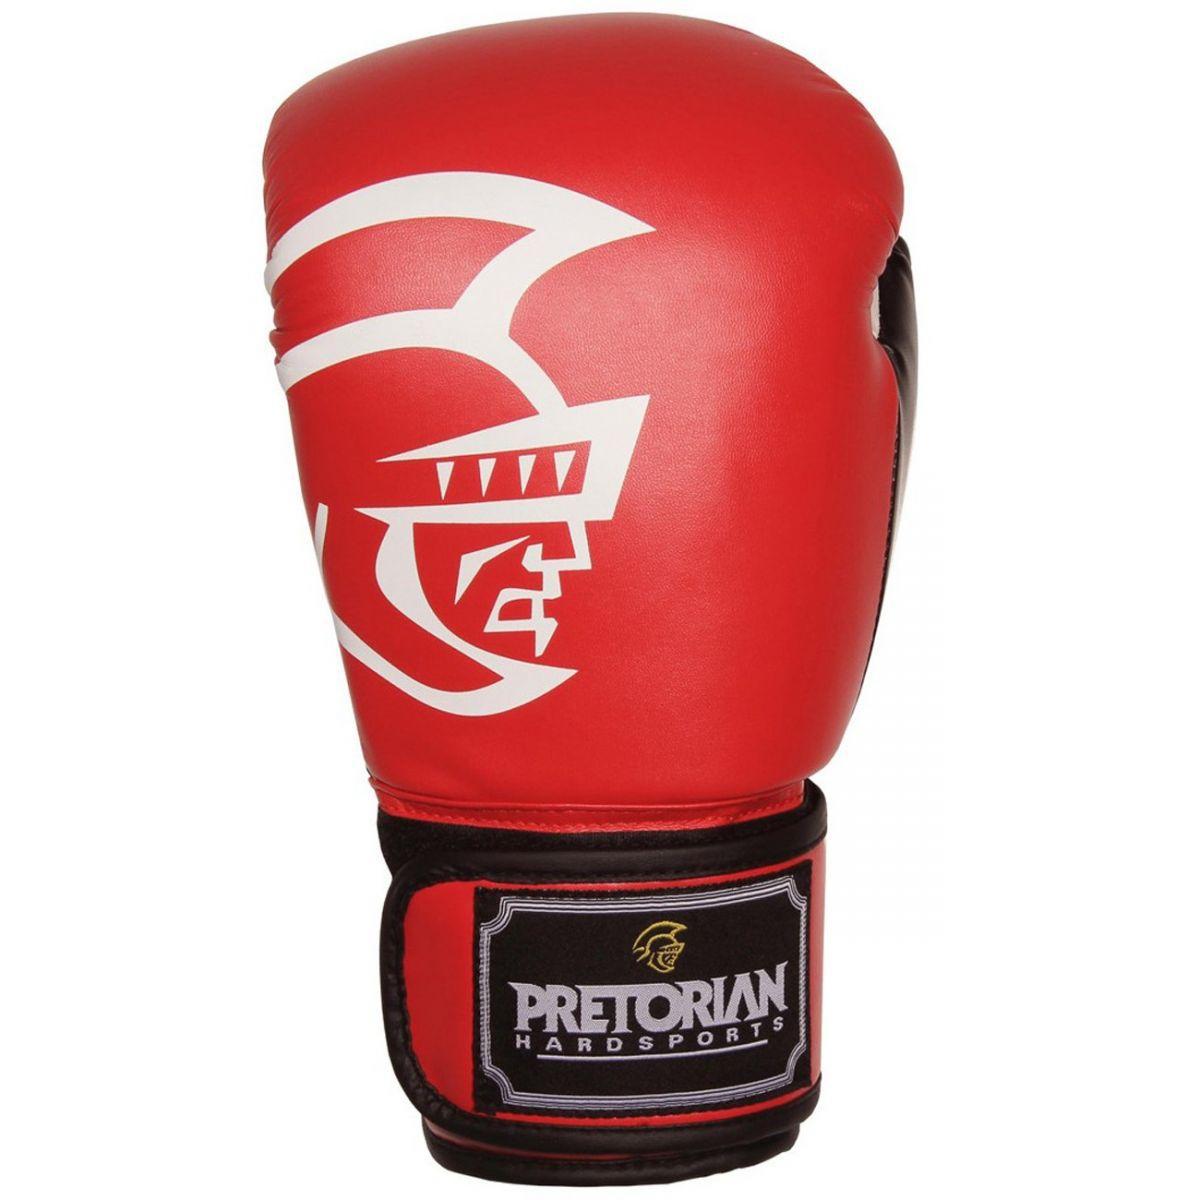 Luvas Boxe / Muay Thai - Training Series - Vermelho/Preto- Pretorian - 10/12/14/16 OZ .